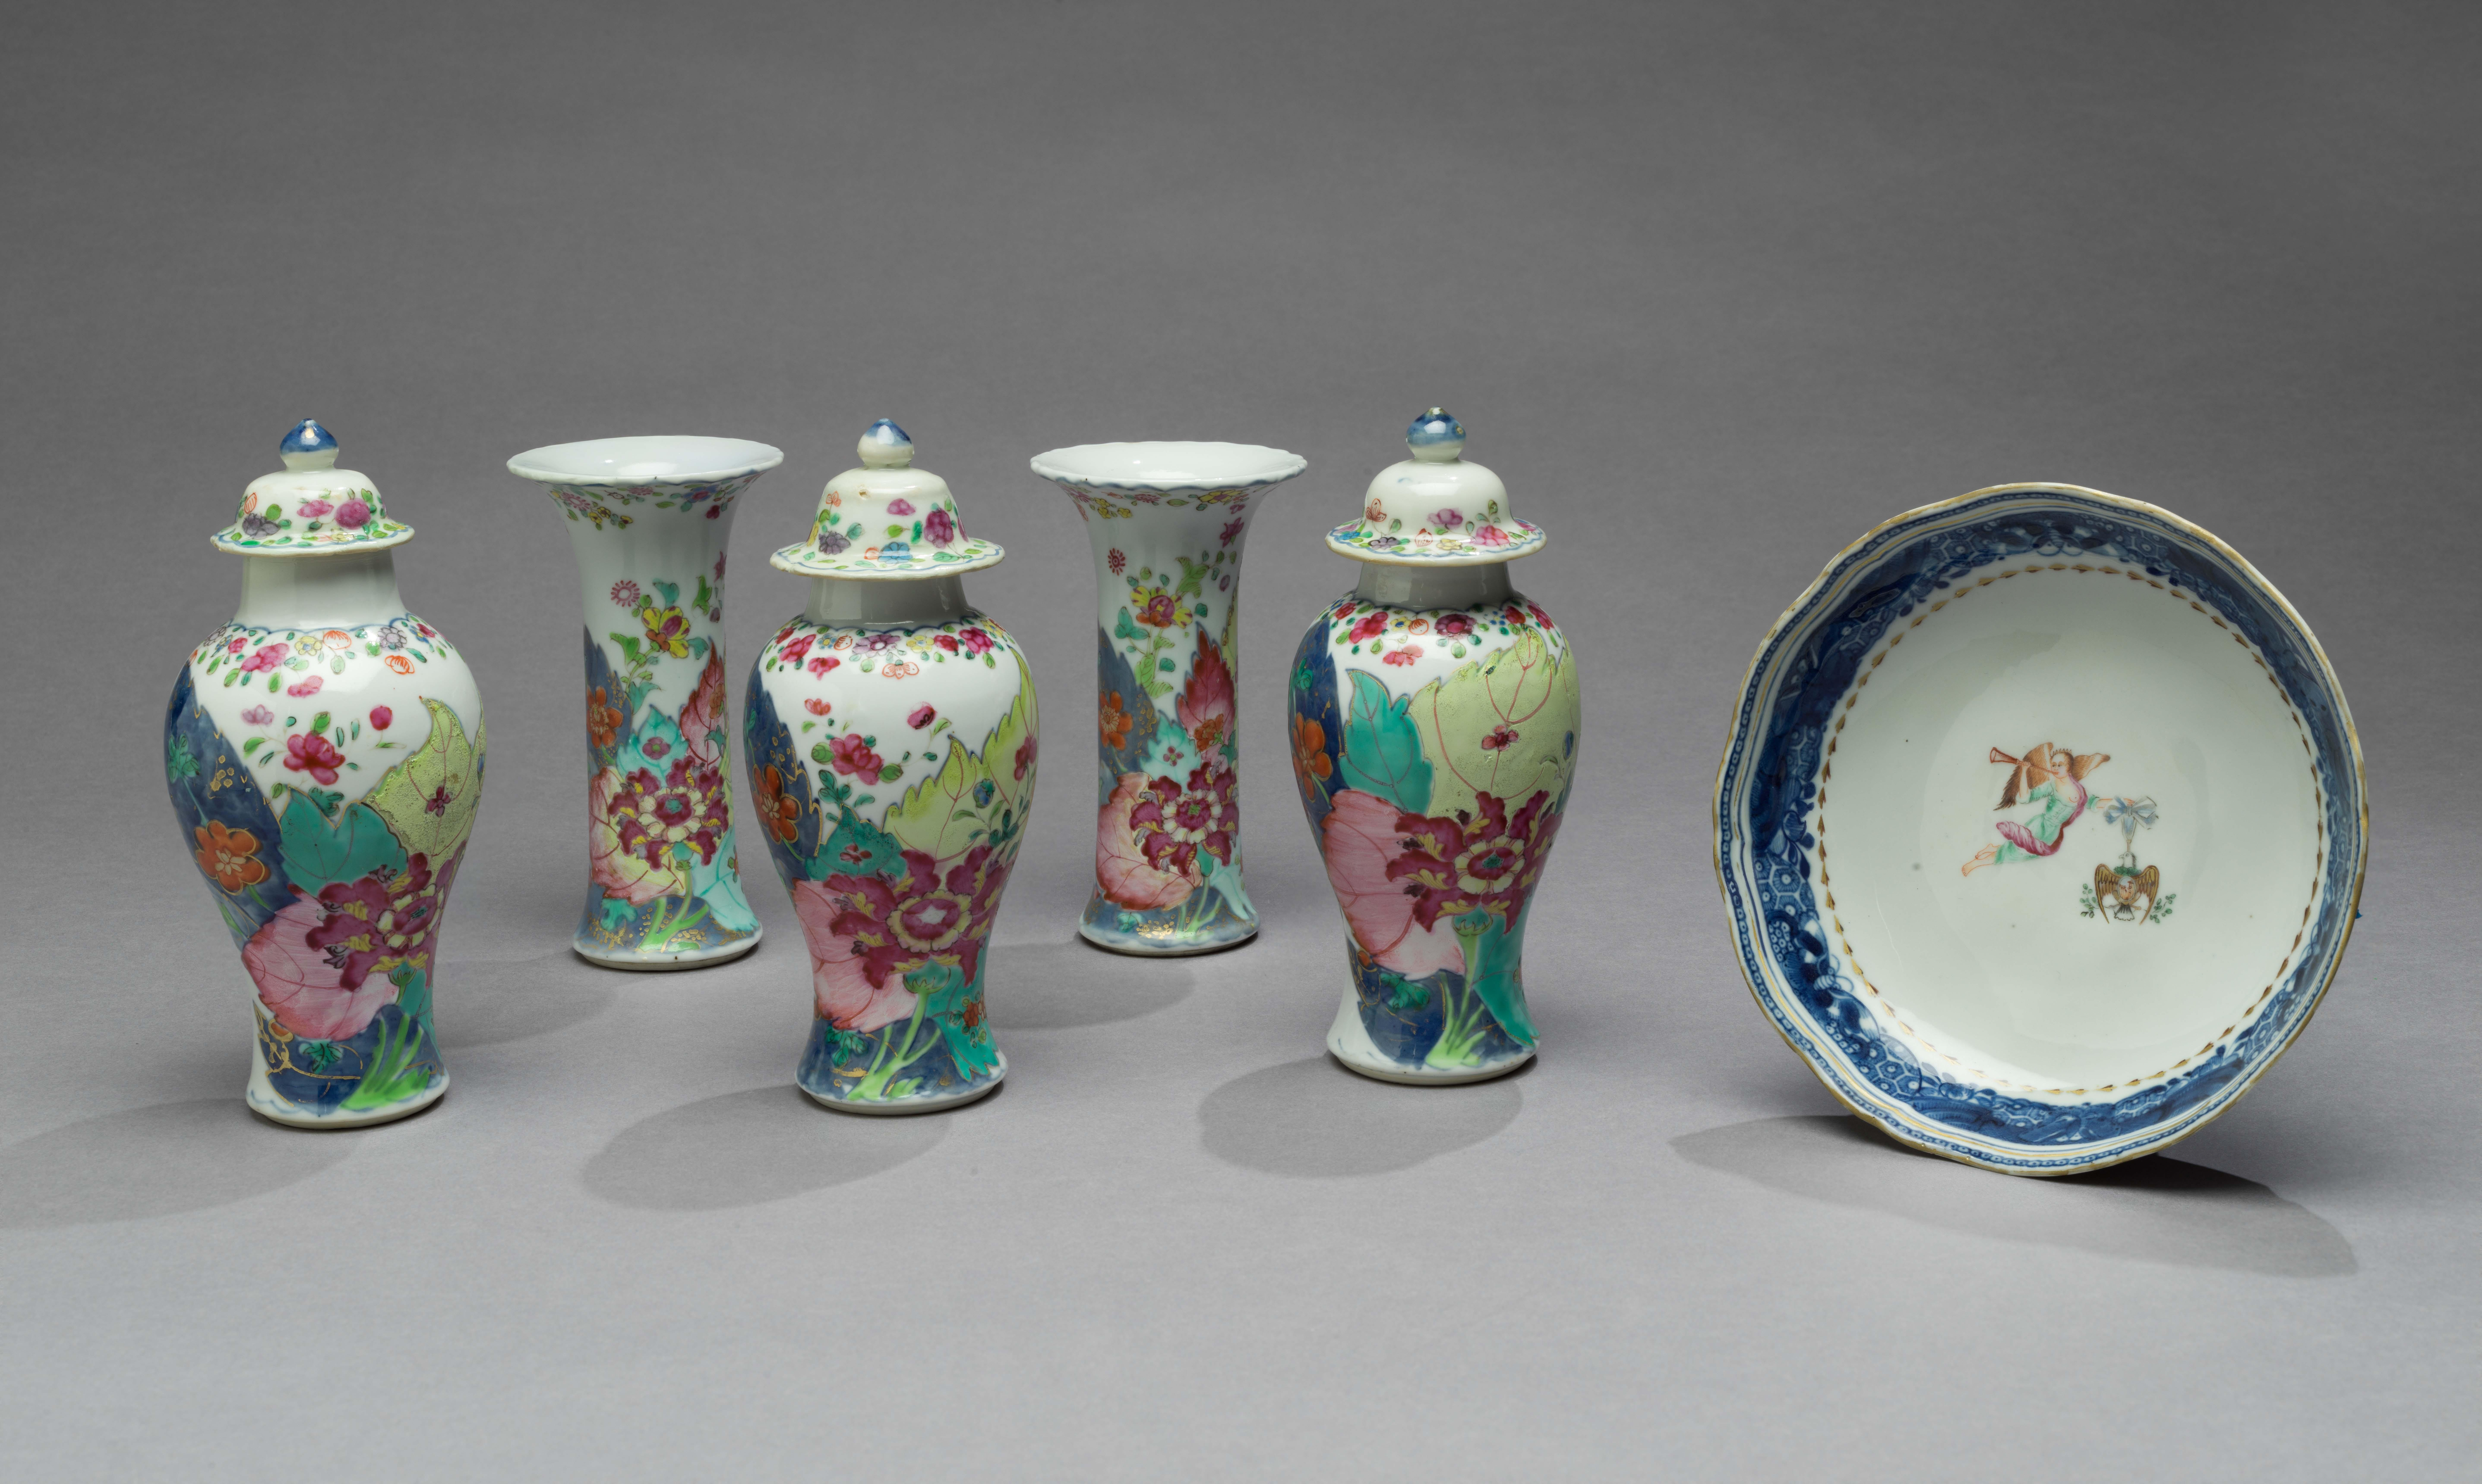 Five-piece garniture made of hard-paste porcelain in Jingdezhen, China, circa 1785